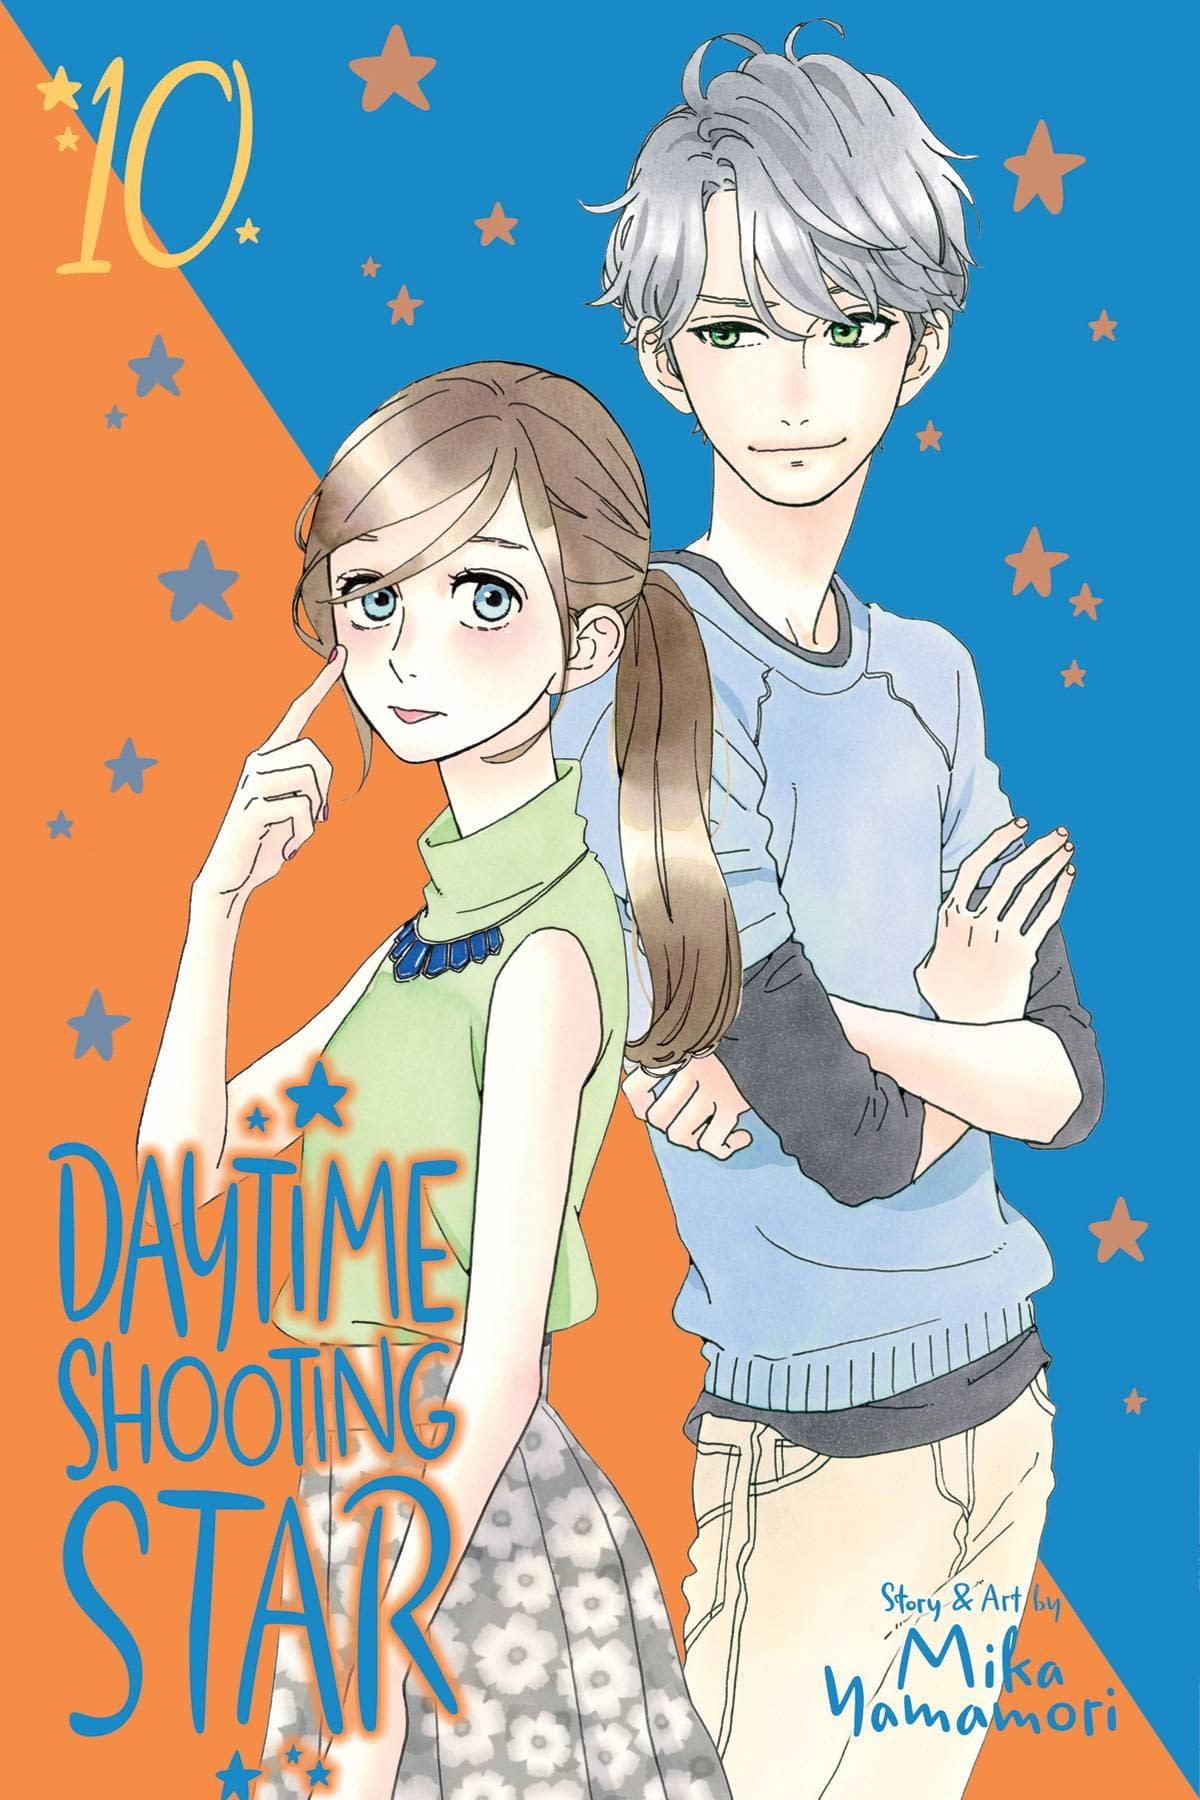 DAYTIME SHOOTING STAR GN VOL 10